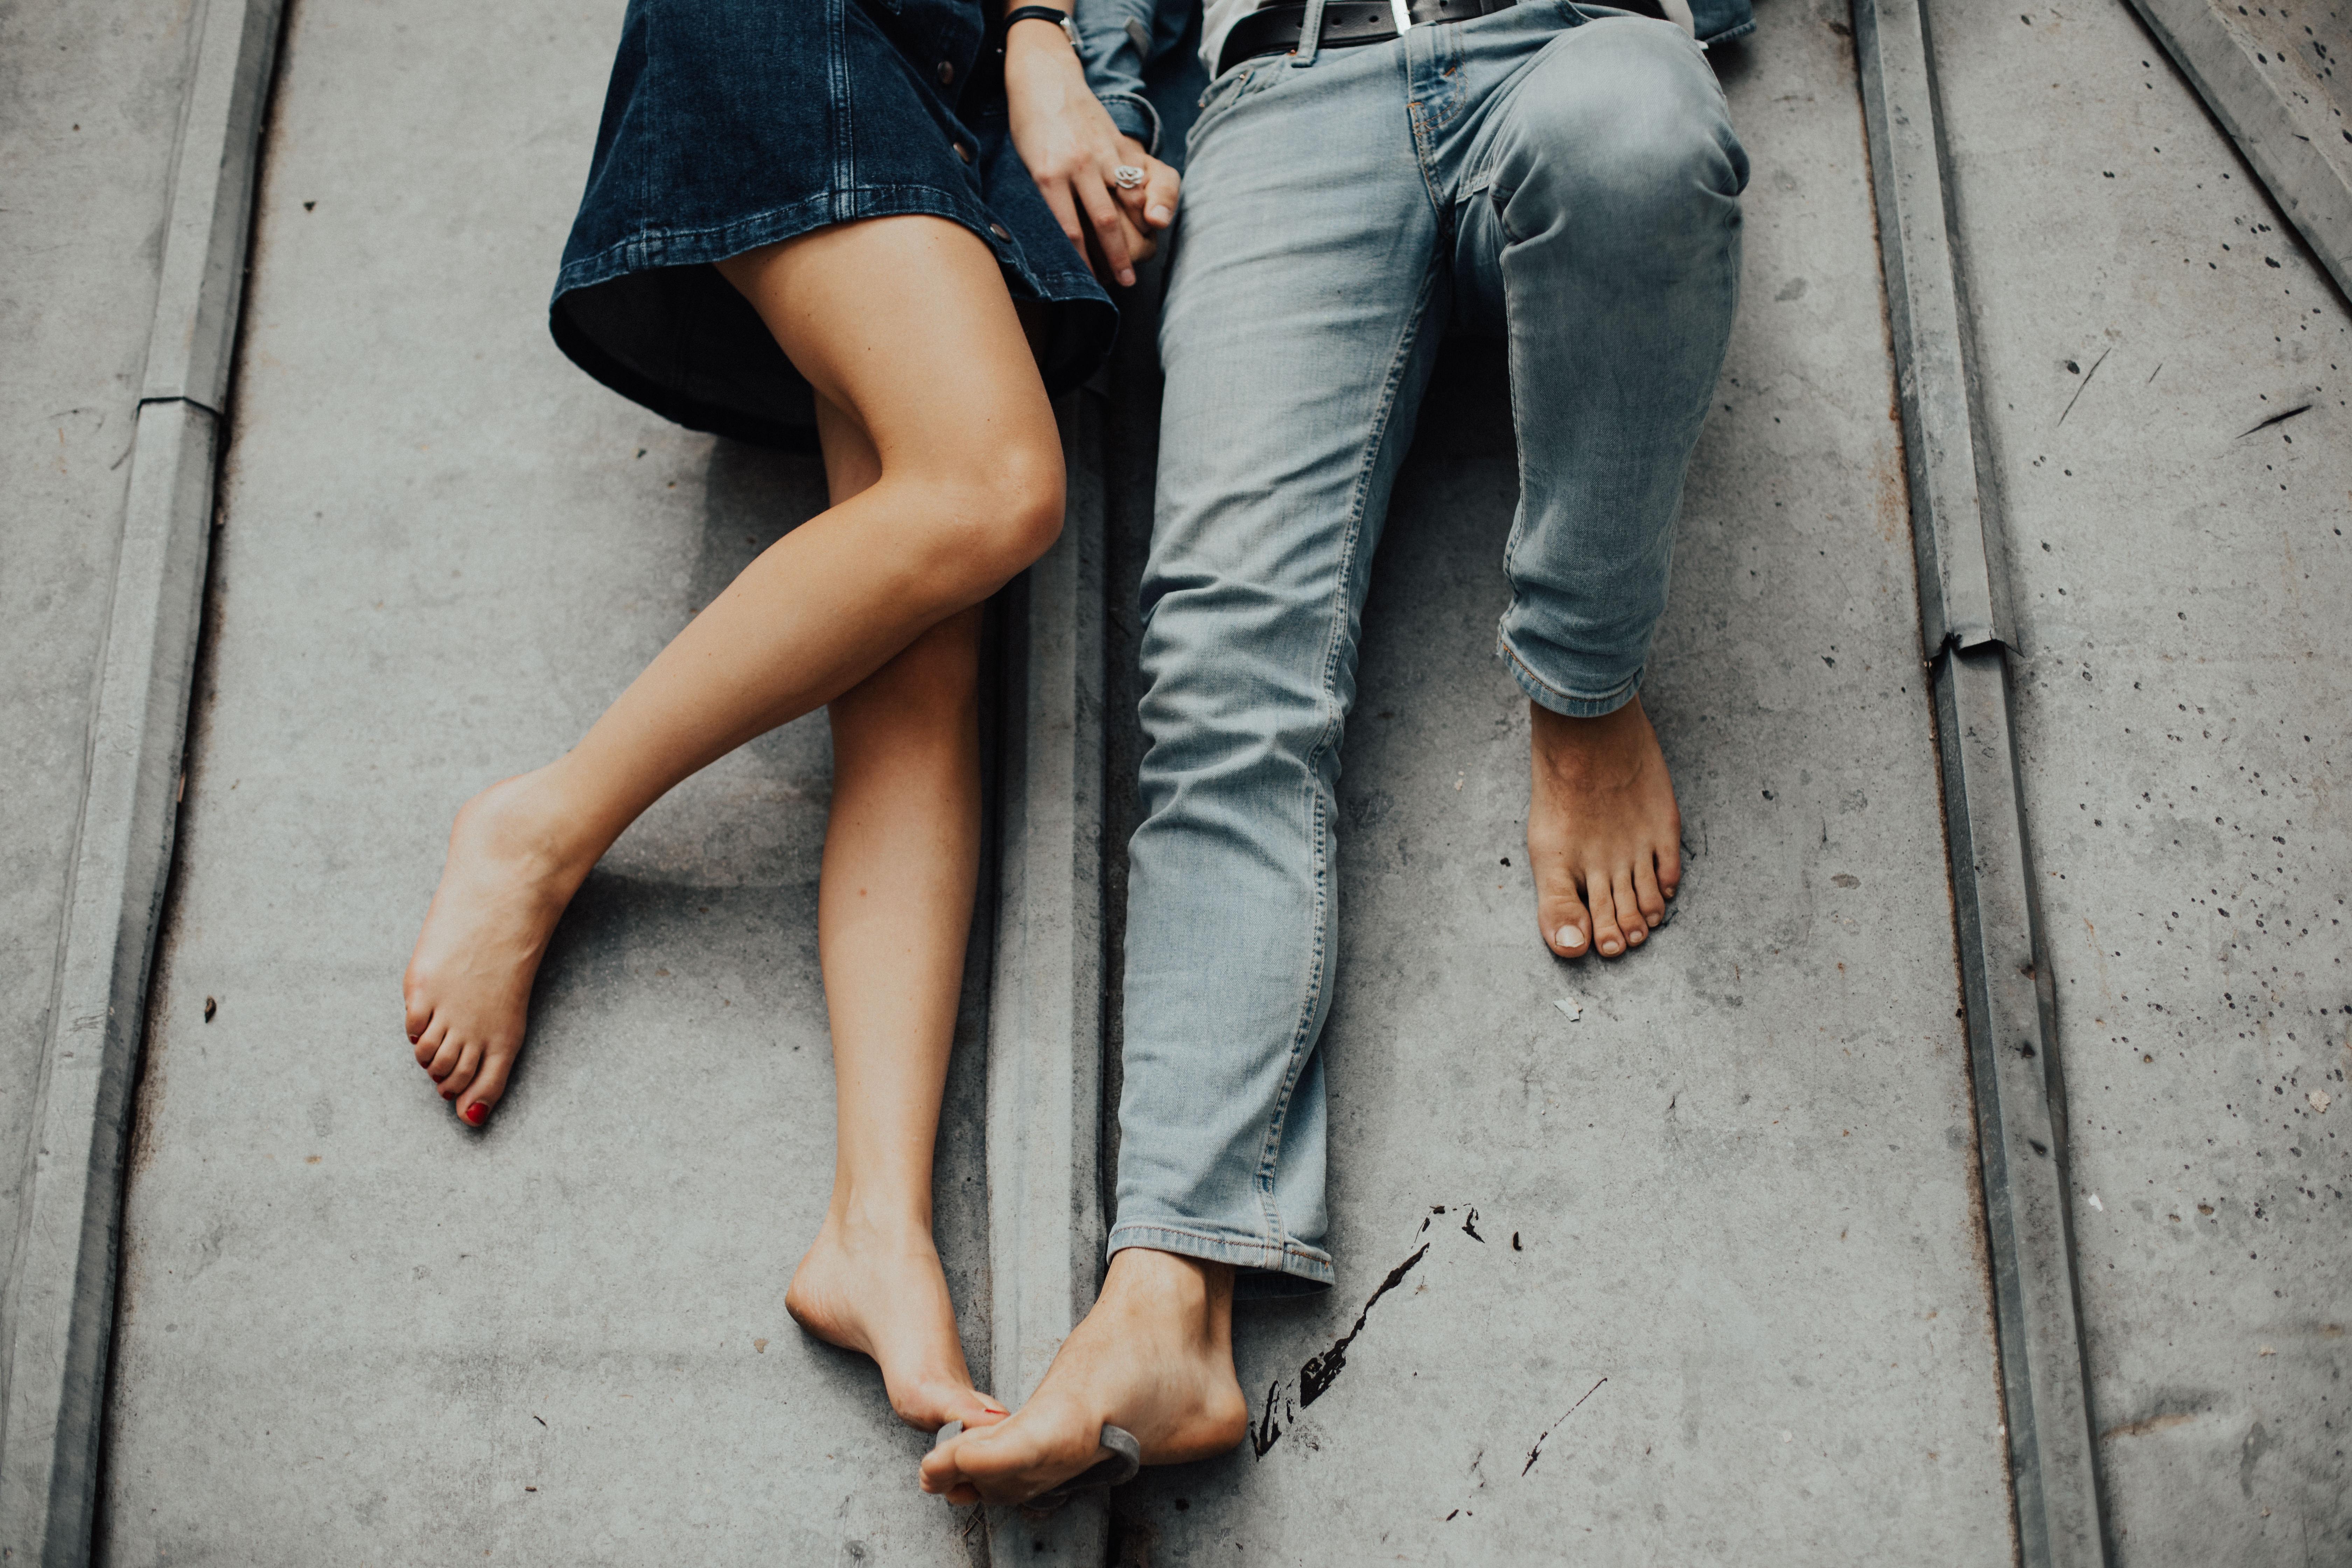 Consejos para cuidar tus pies